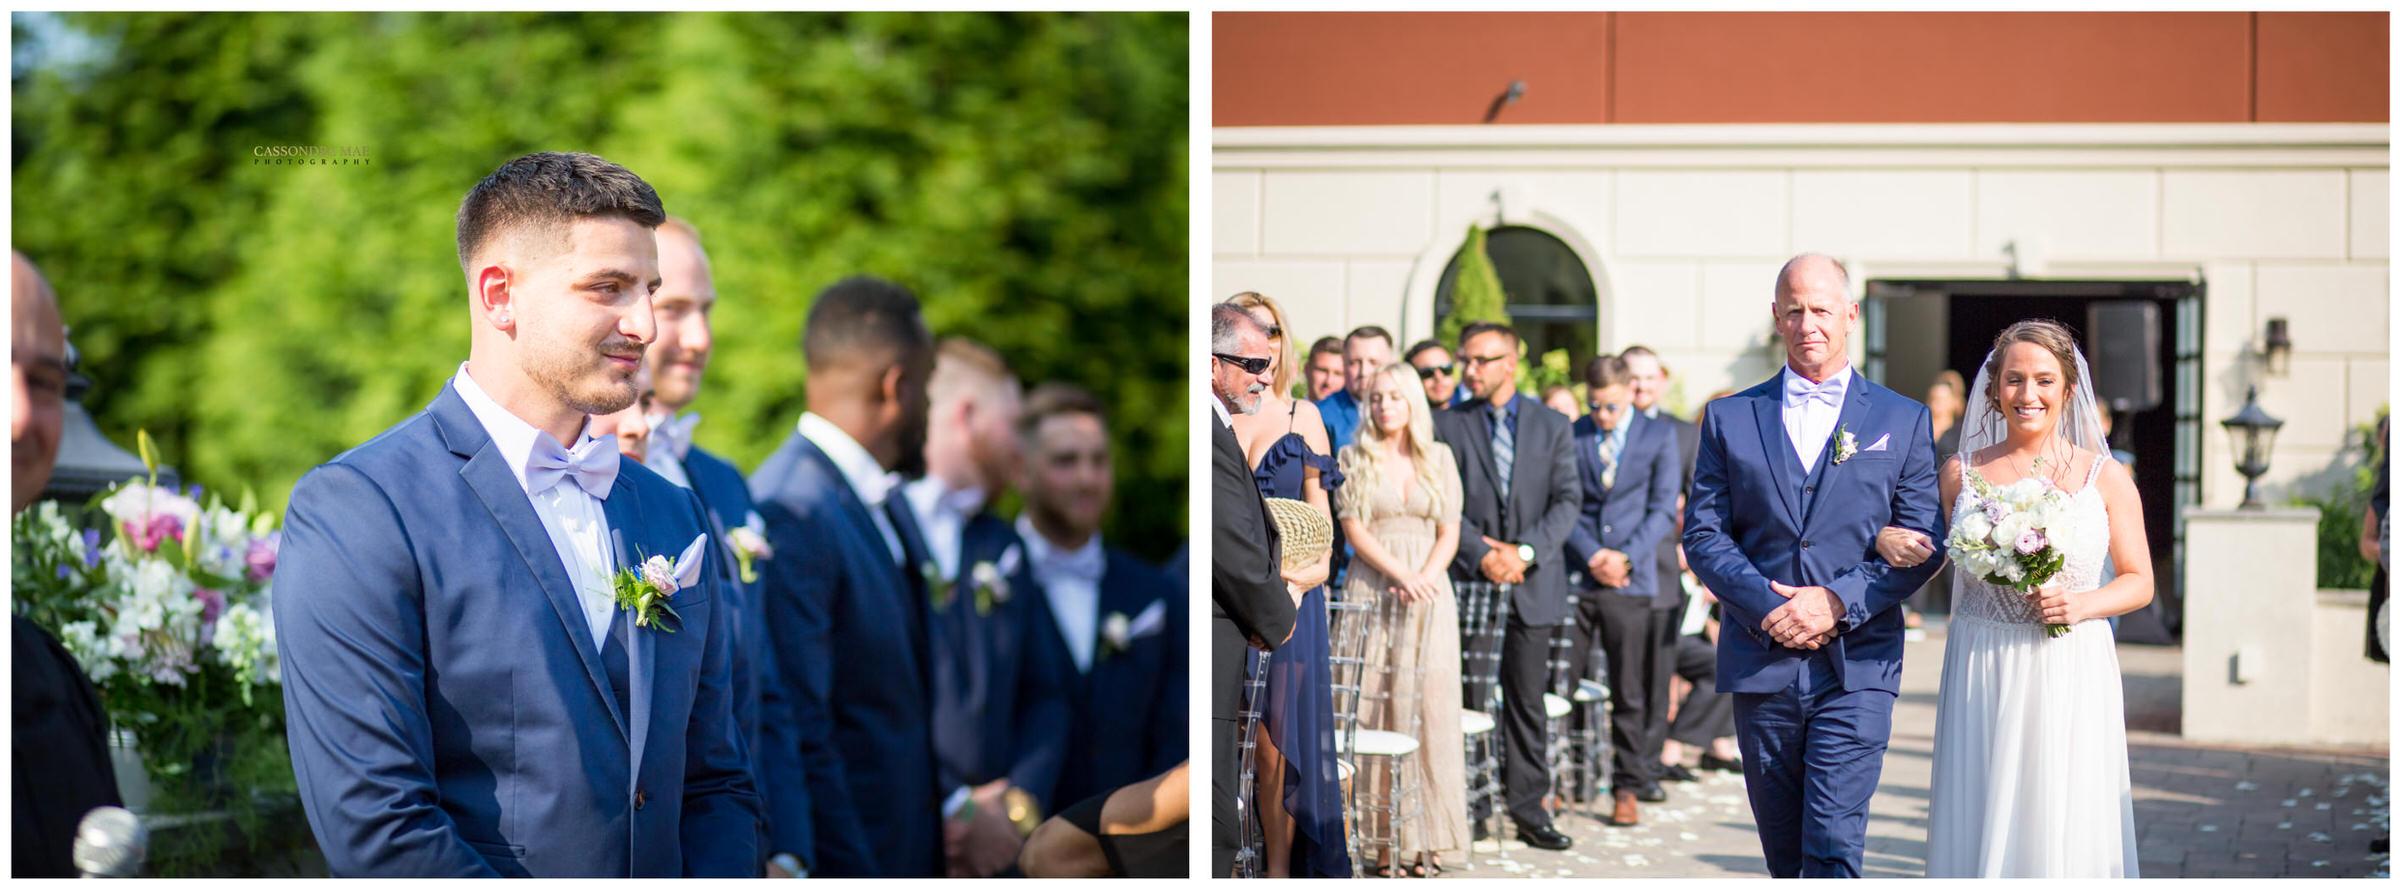 Cassondre Mae Photography Villa Venezia Wedding Photographer 11.jpg